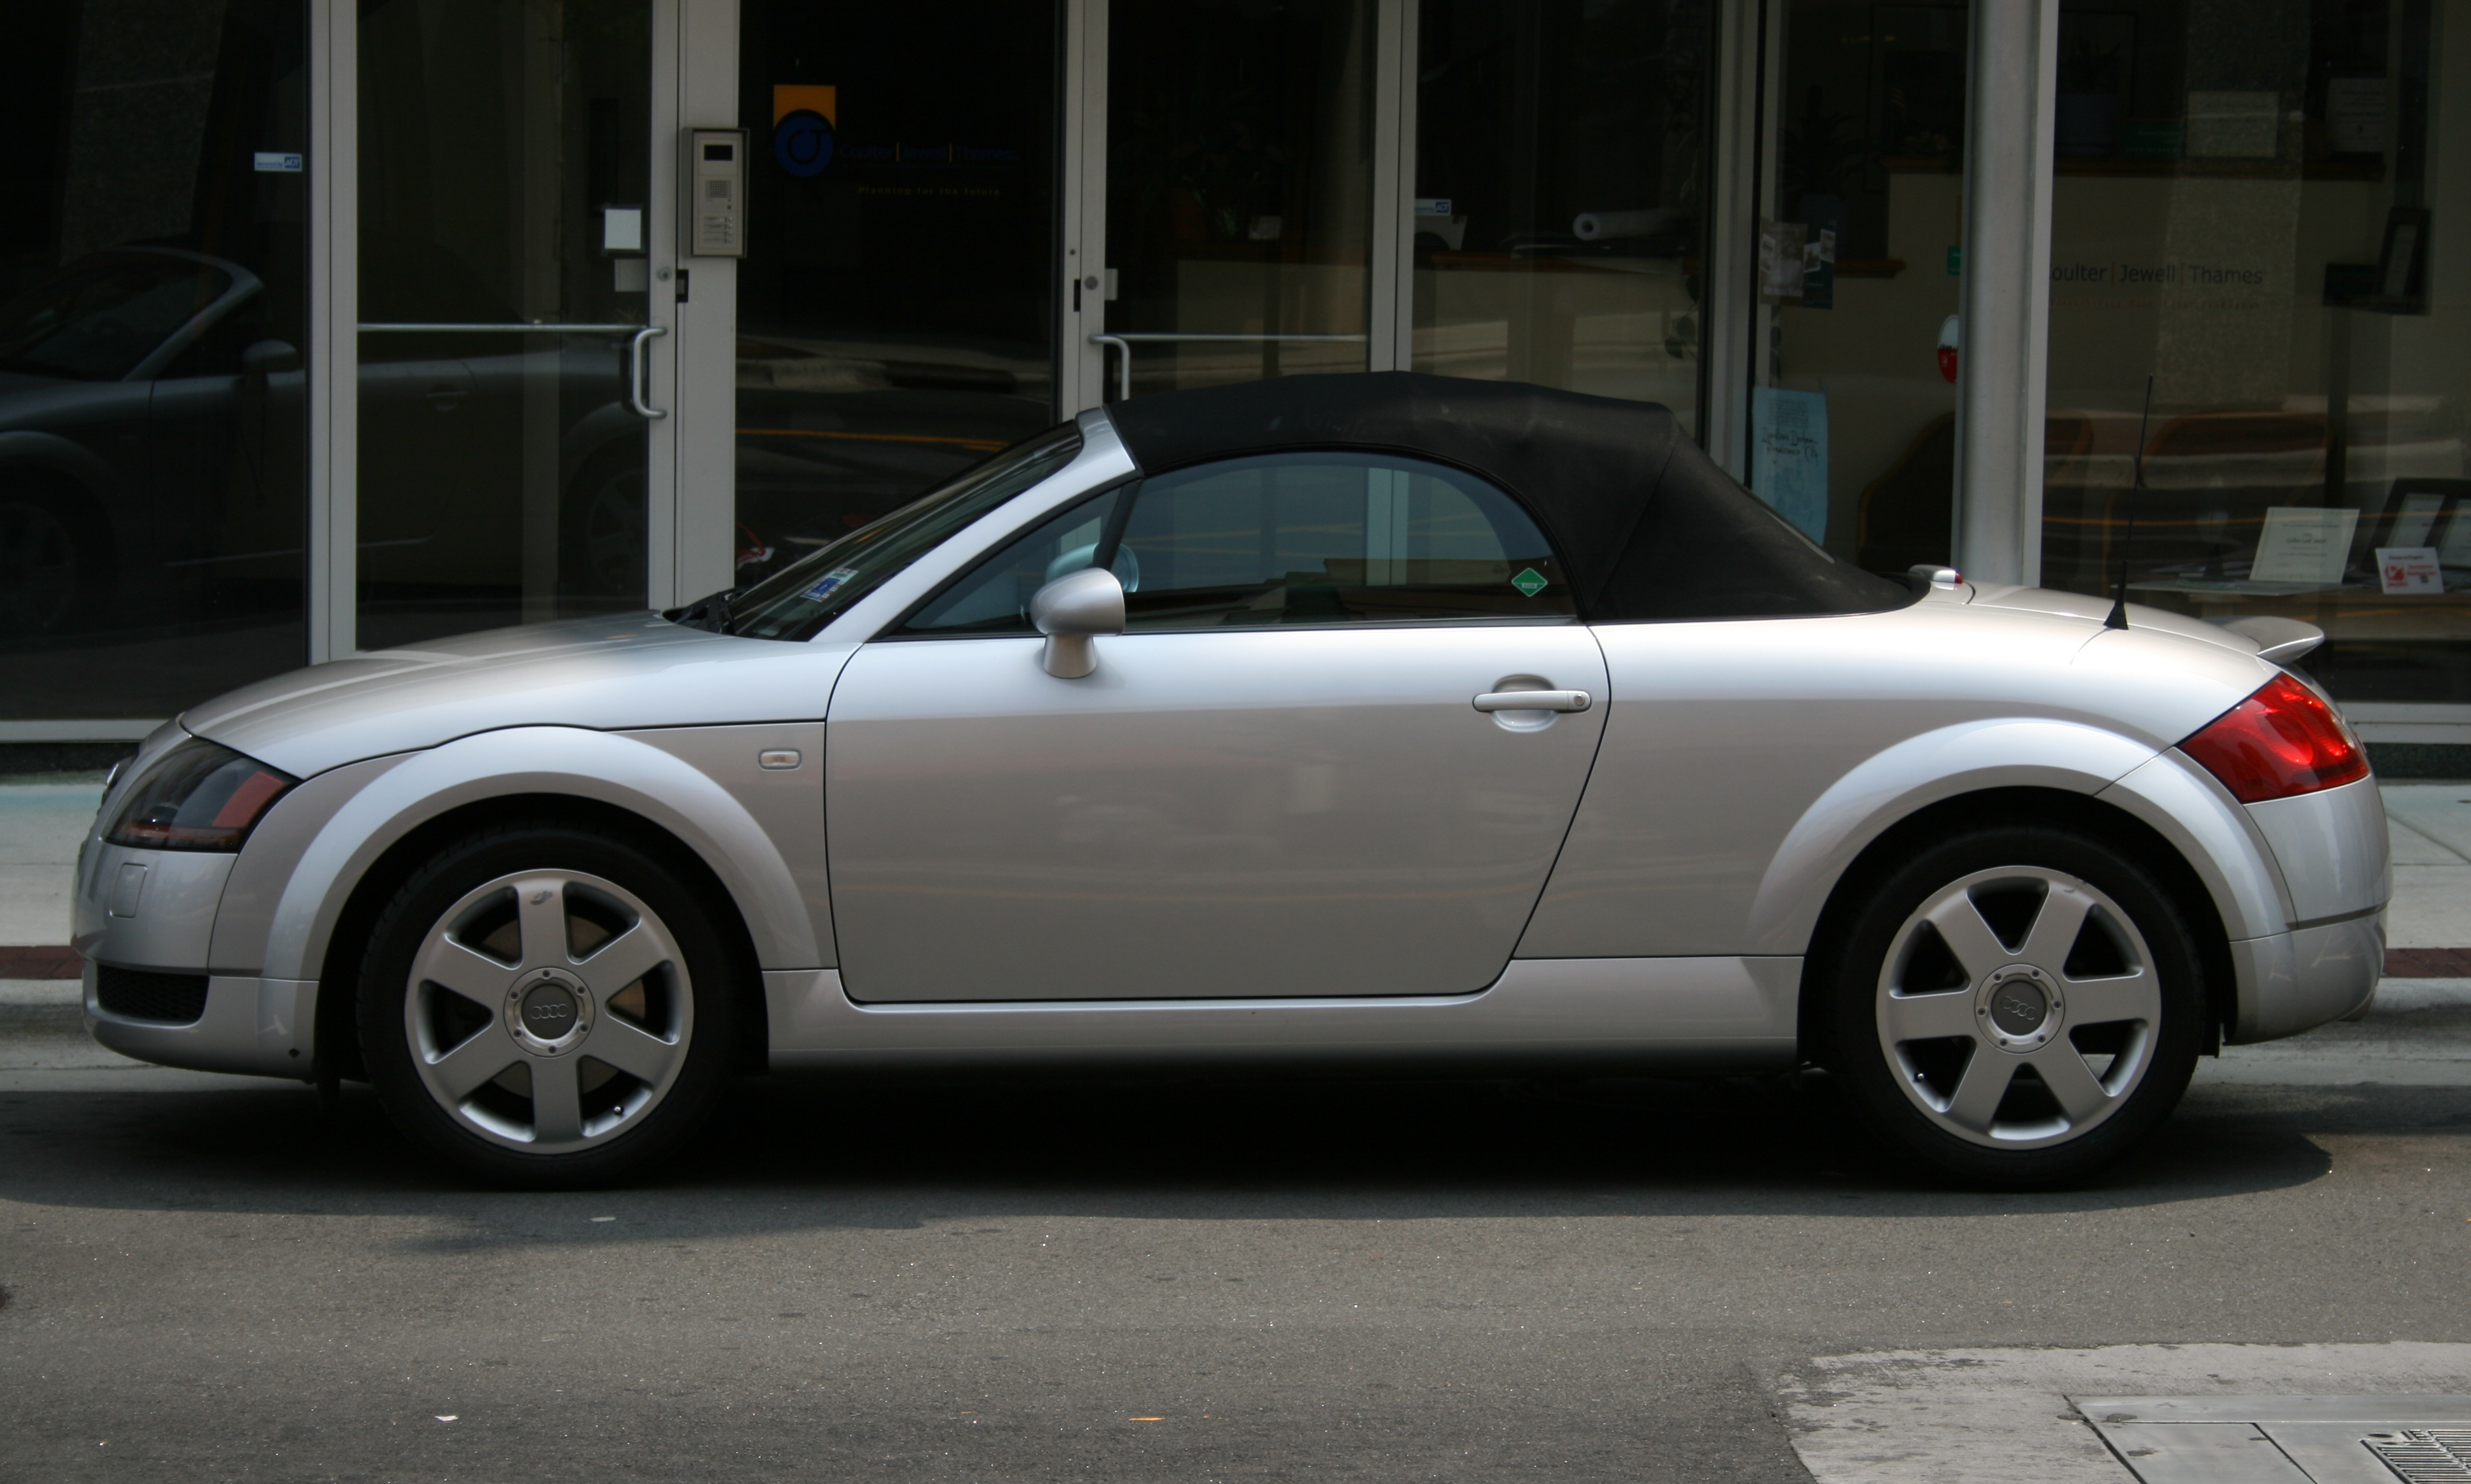 2008 Audi Tt Image 13